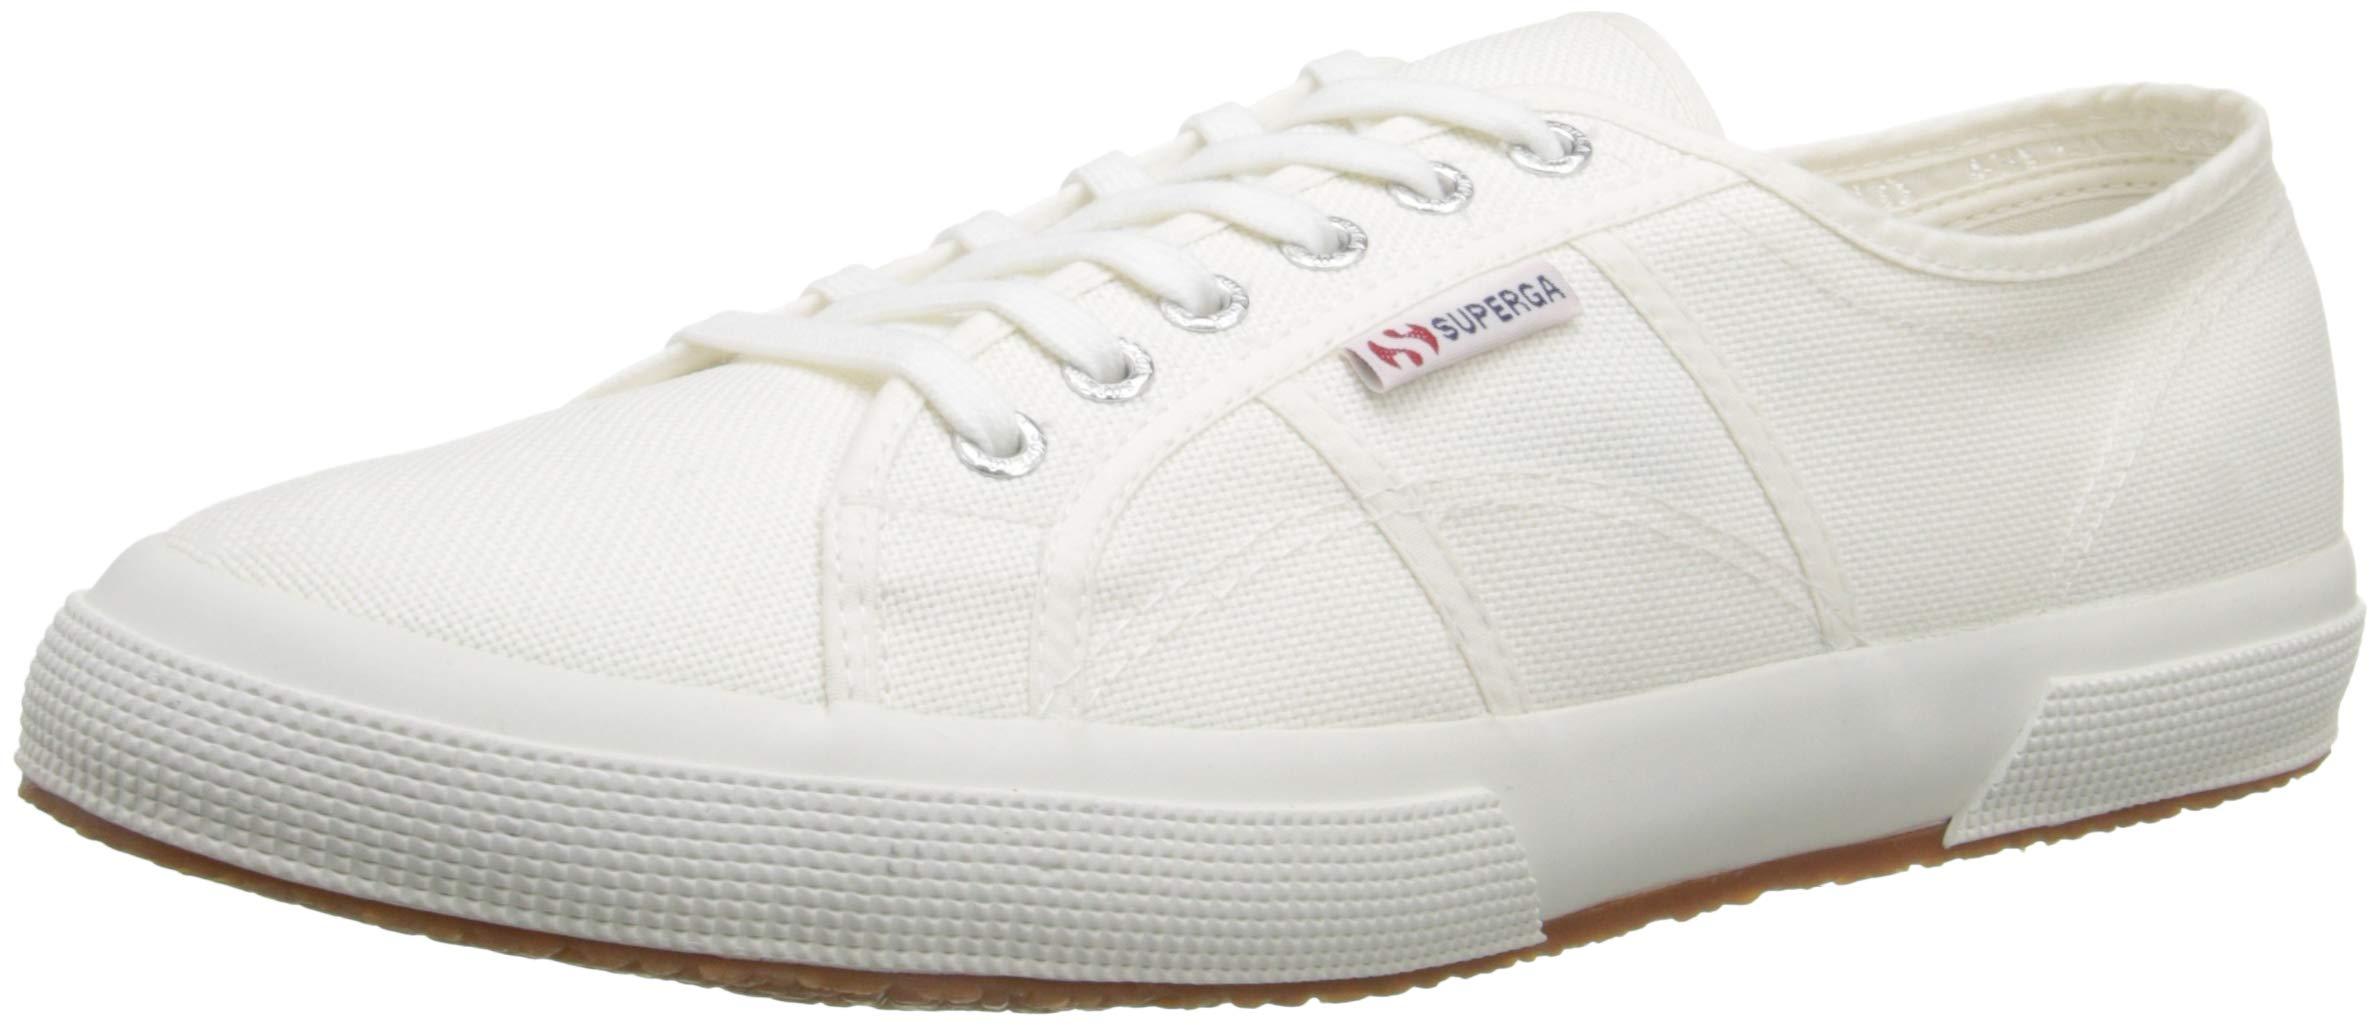 Superga Unisex 2750 Cotu Classic Sneaker,White,39 EU (Women's 8 M US/Men's 6.5 M US) by Superga